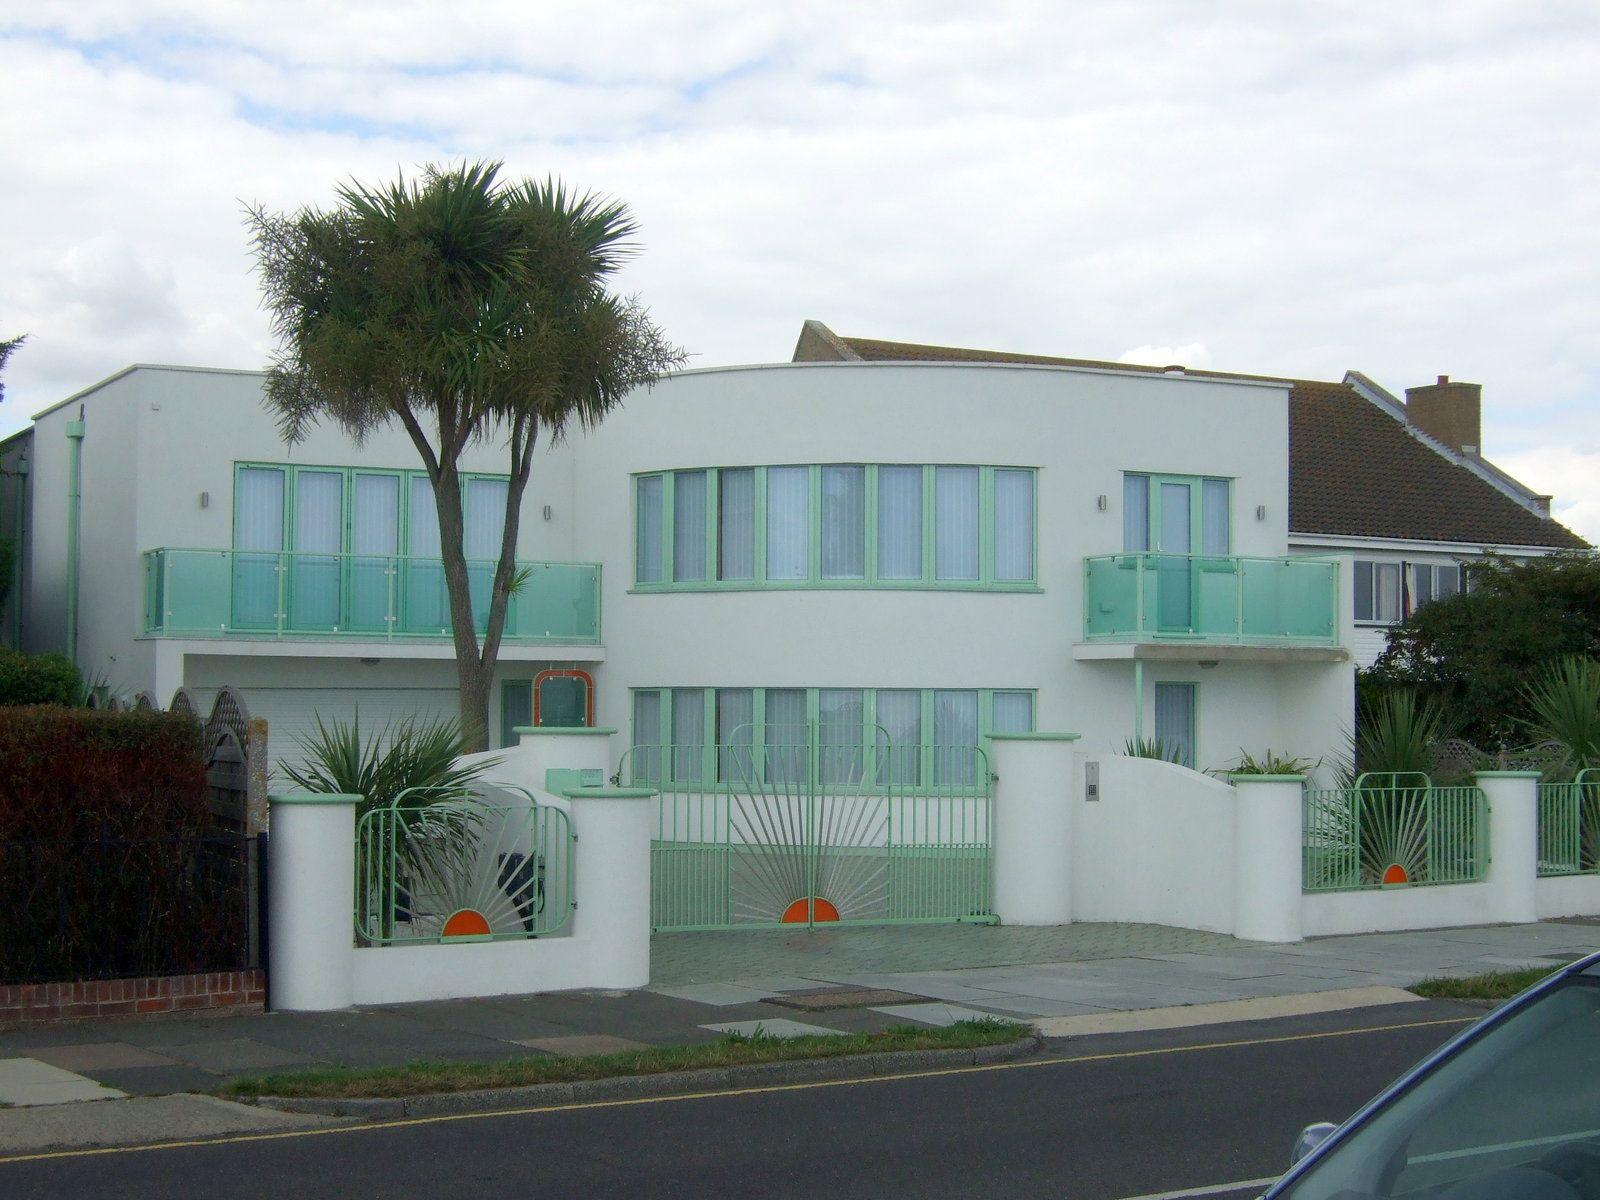 Art Deco Home art-deco-home- i-like-the-fence-detail | architechture | pinterest